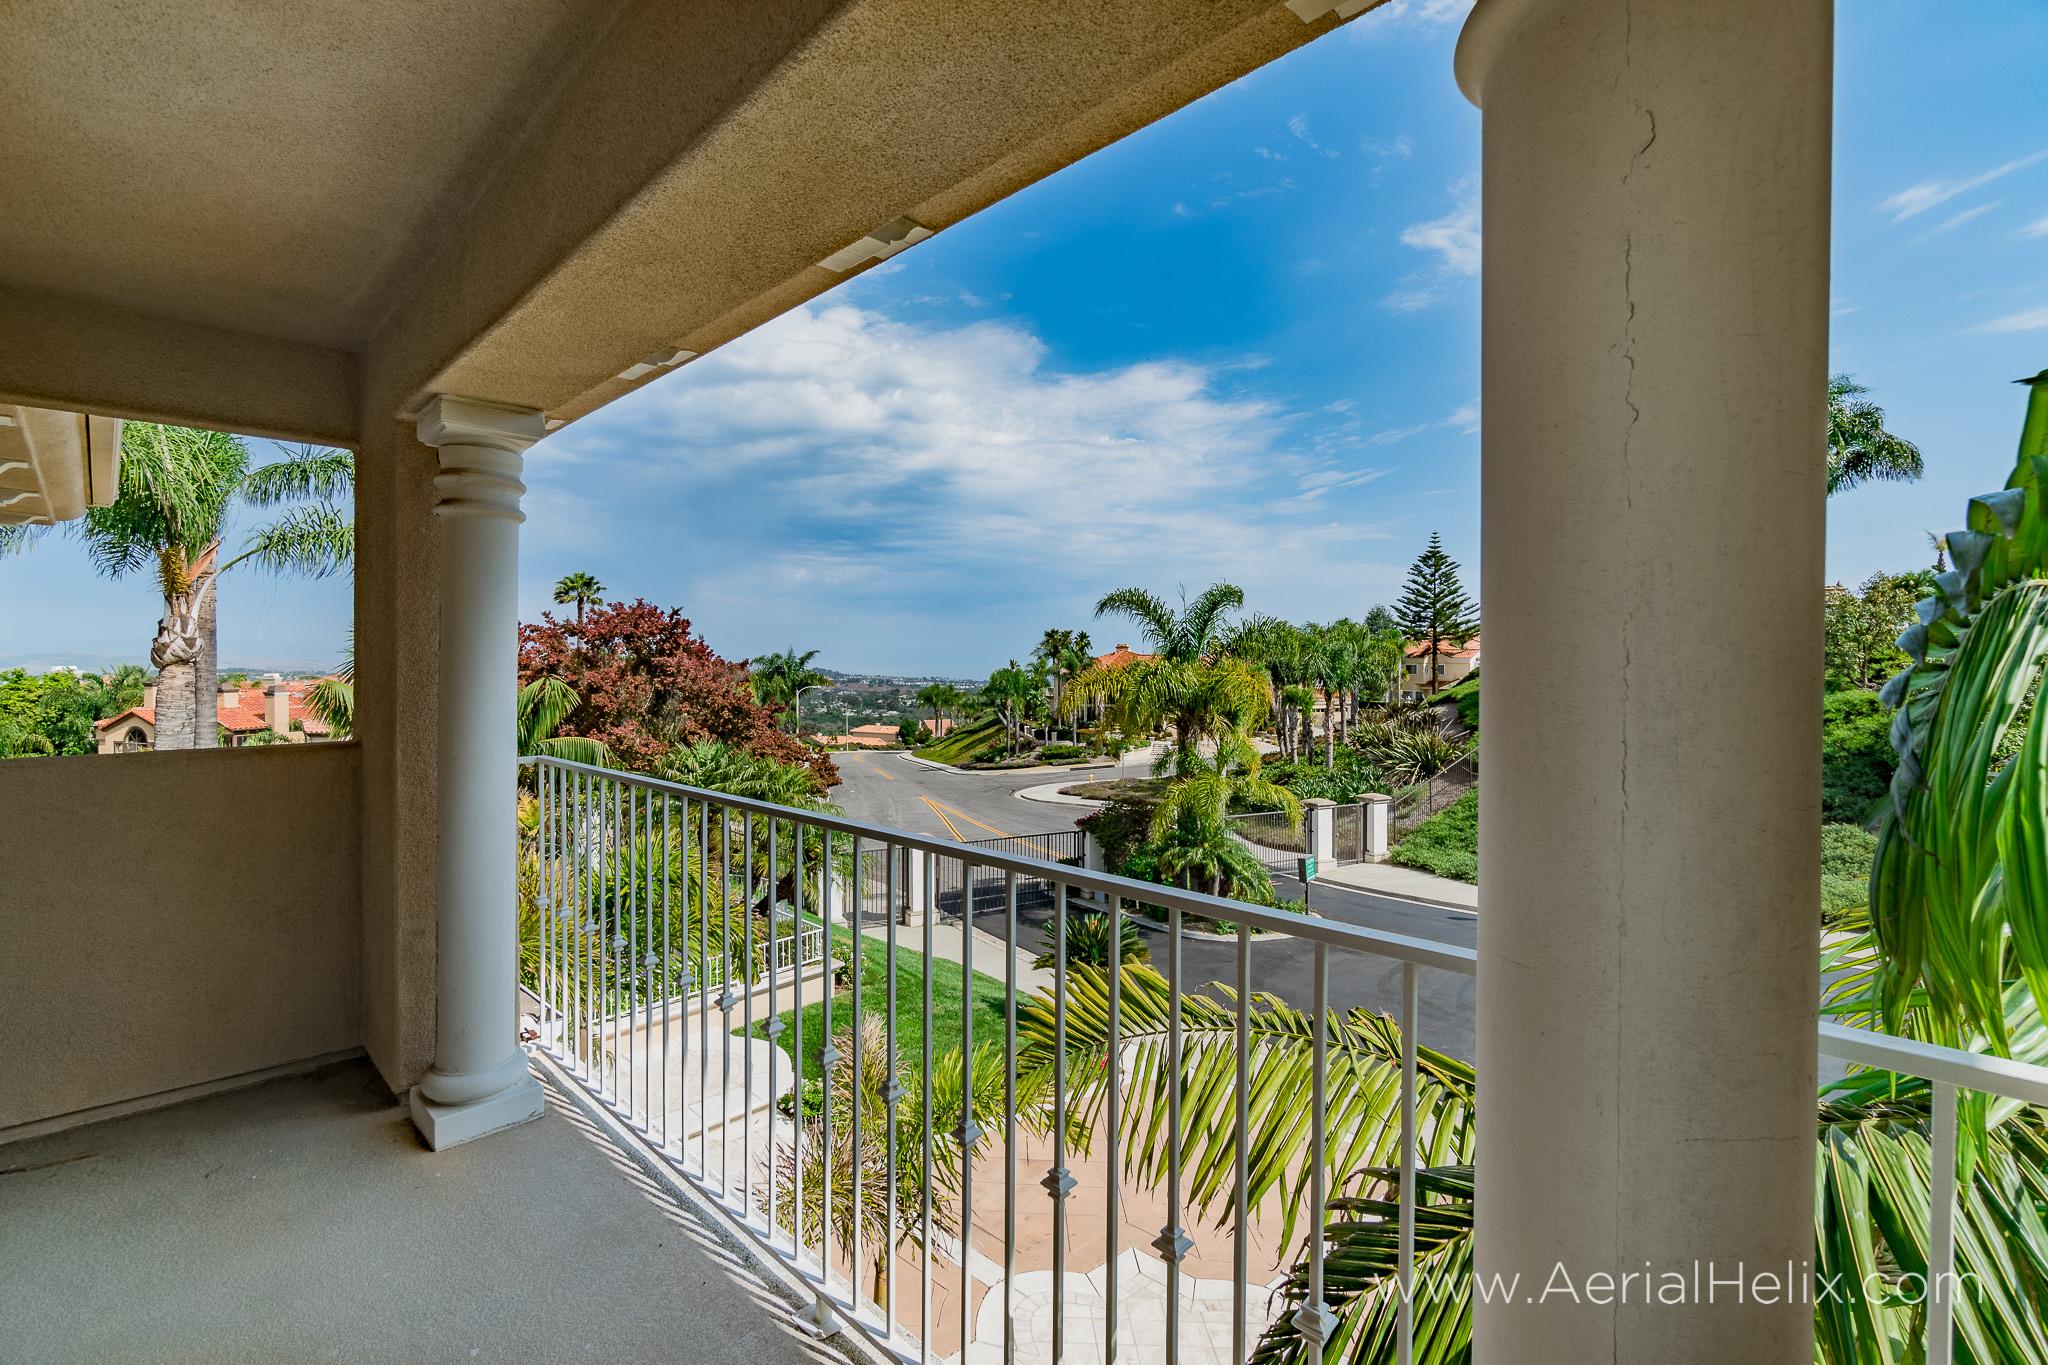 HELIX - Vista Montemar - real-estate-photographer-41.jpg